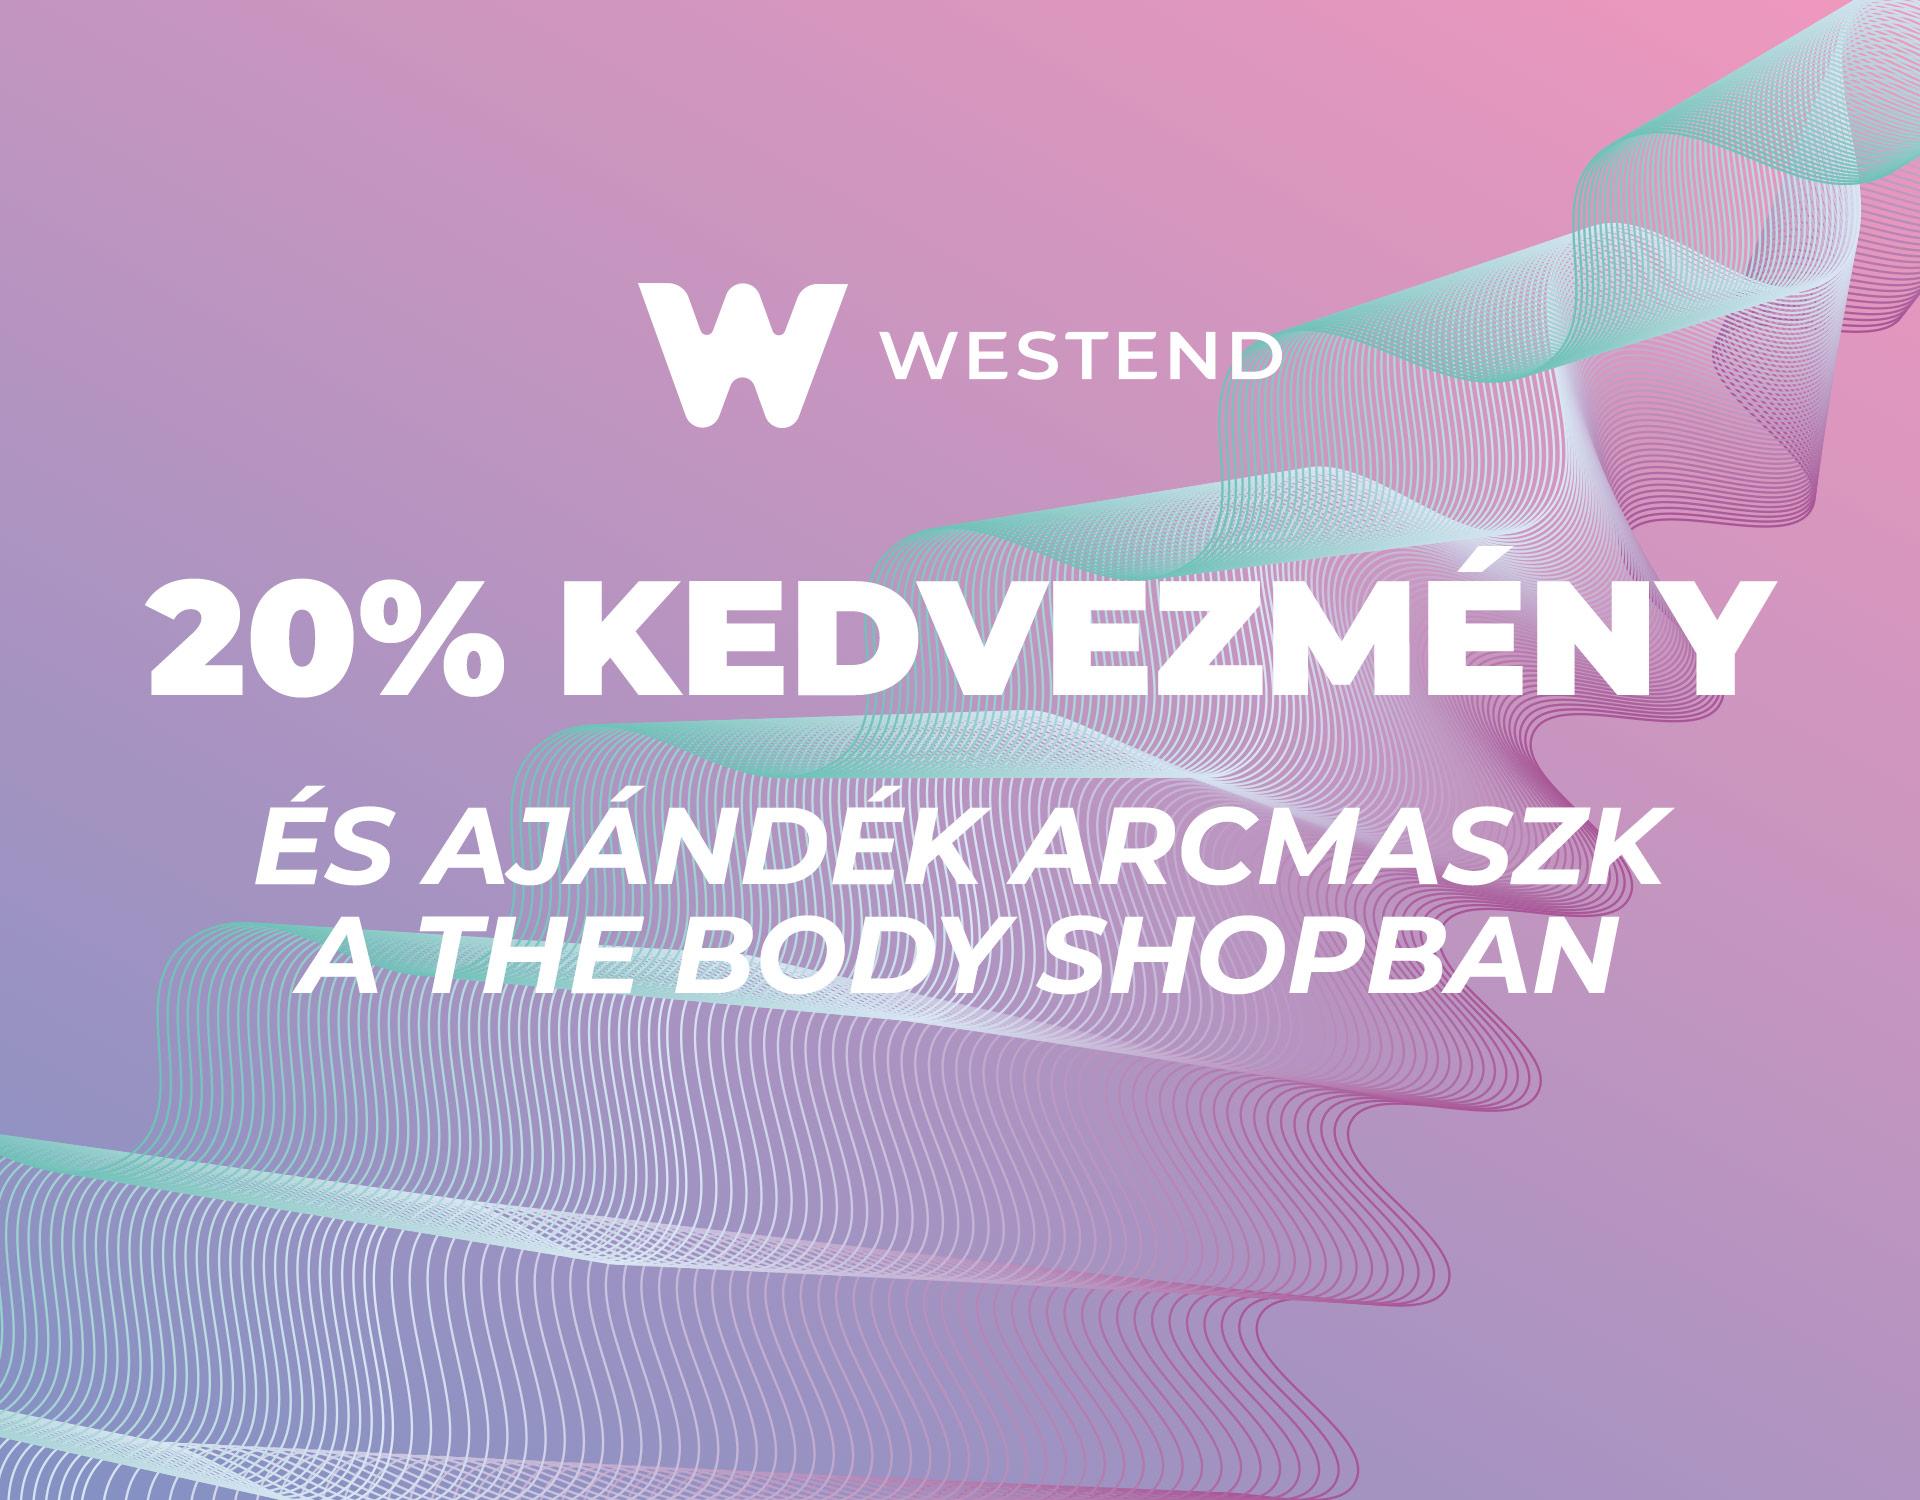 Március 26. - The Body Shop kupon